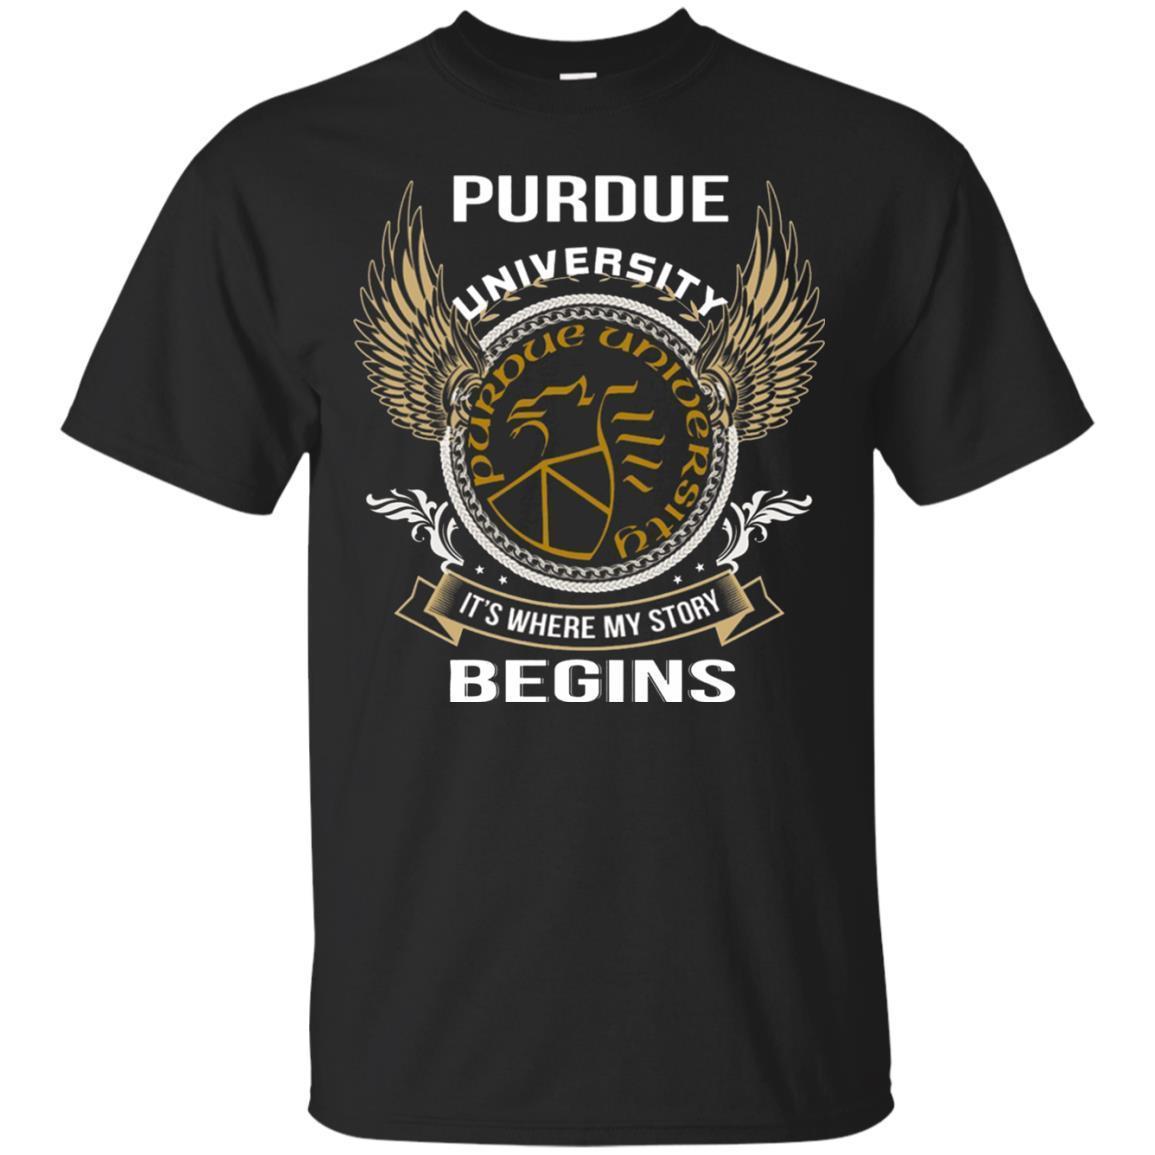 Purdue IU student T-Shirt